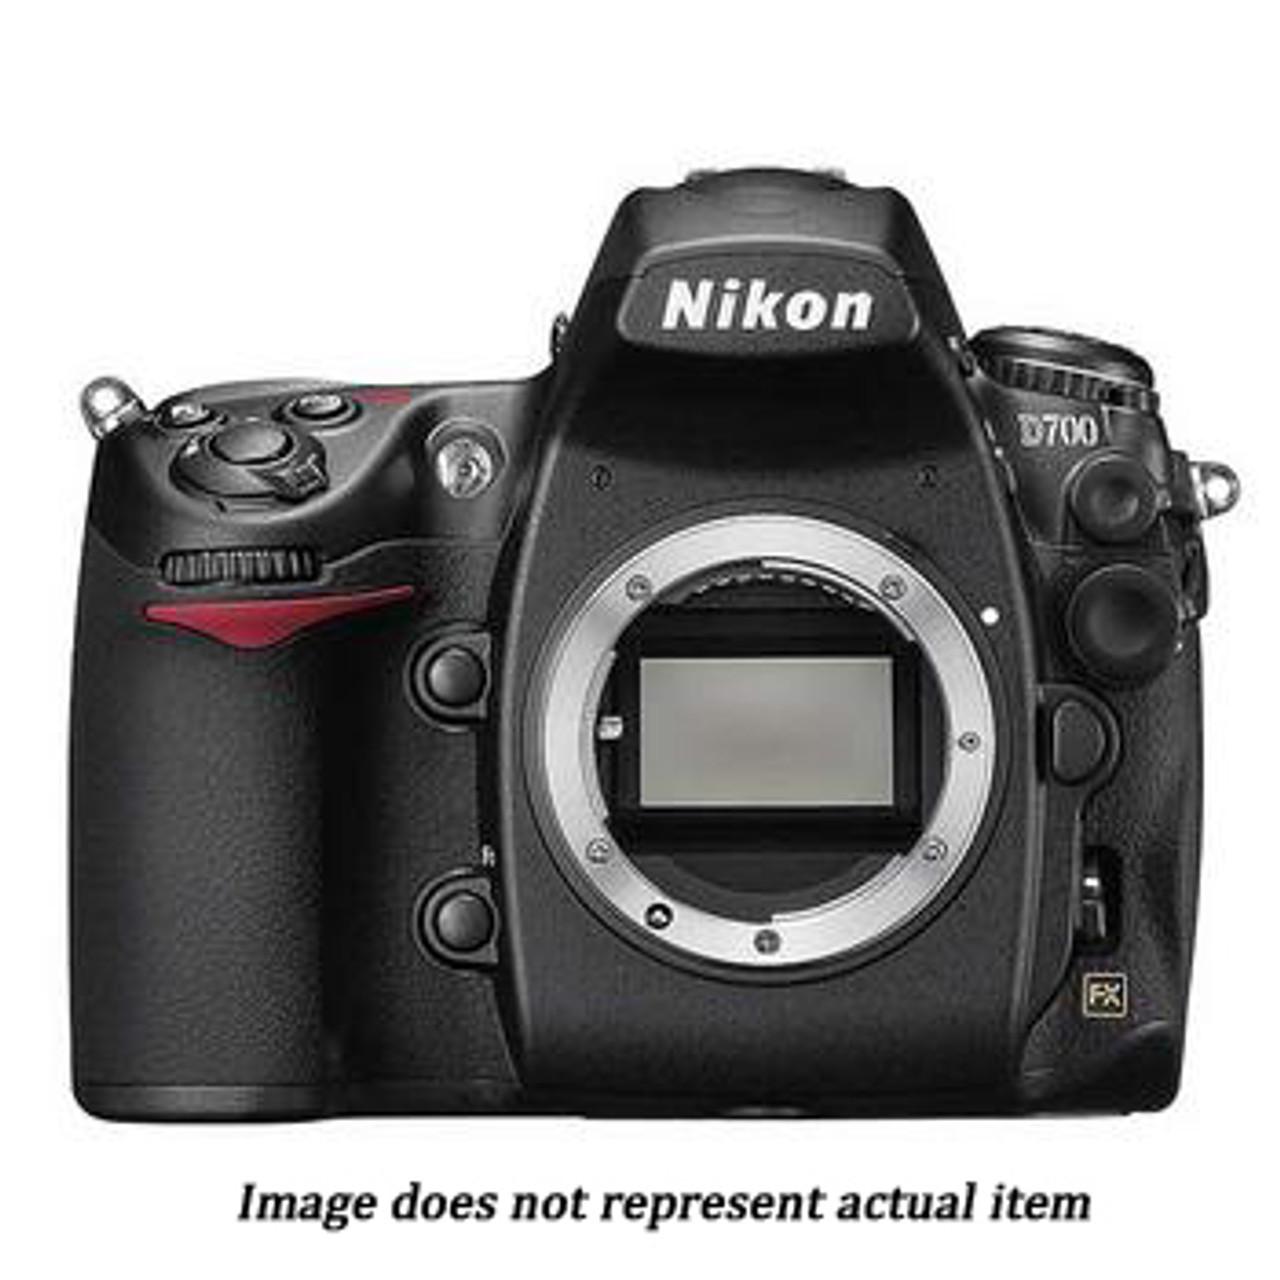 Nikon D700 Body (USED) - S/N 2038157